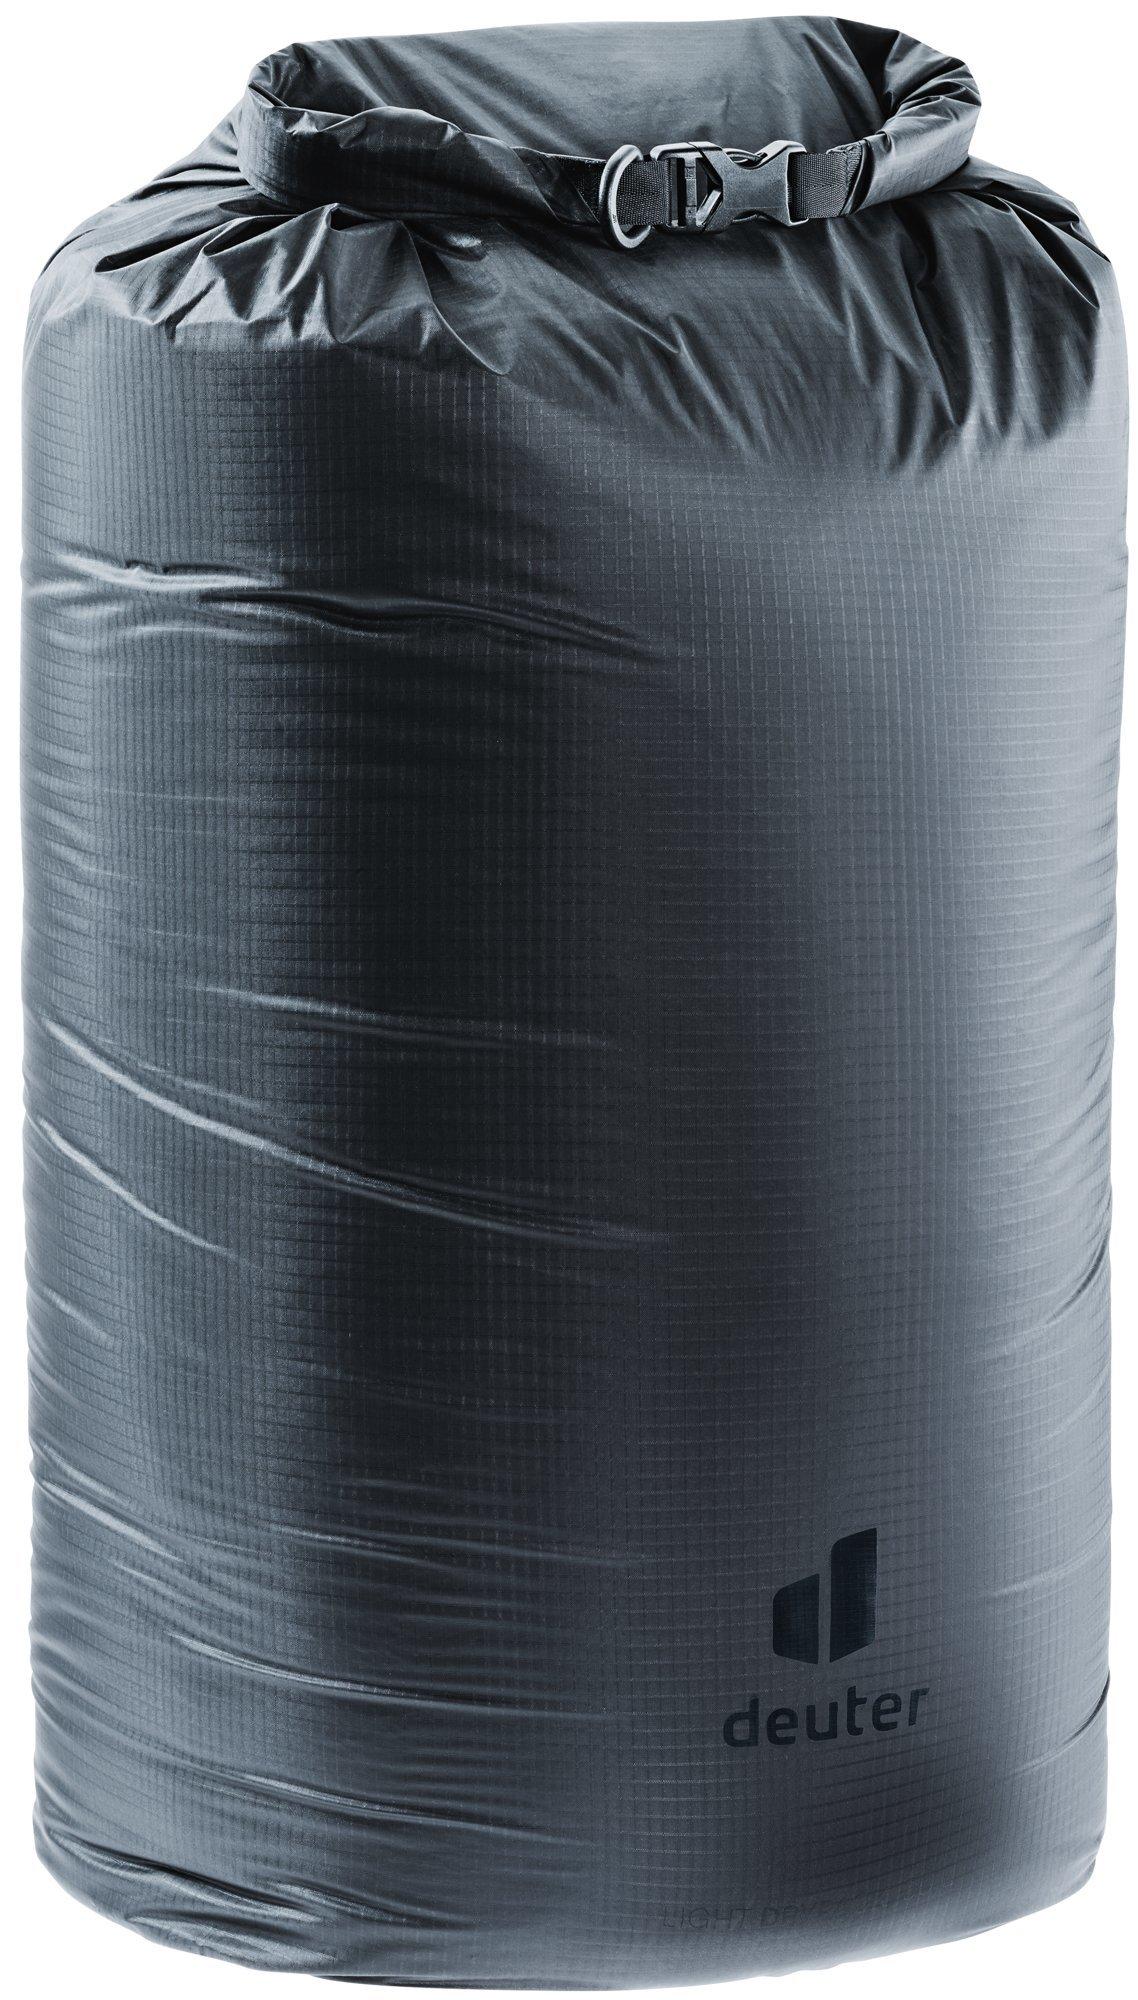 Гермомешки Гермомешок Deuter Light Drypack 30 065f50bc383dac95001e2efa6e0f339f.png